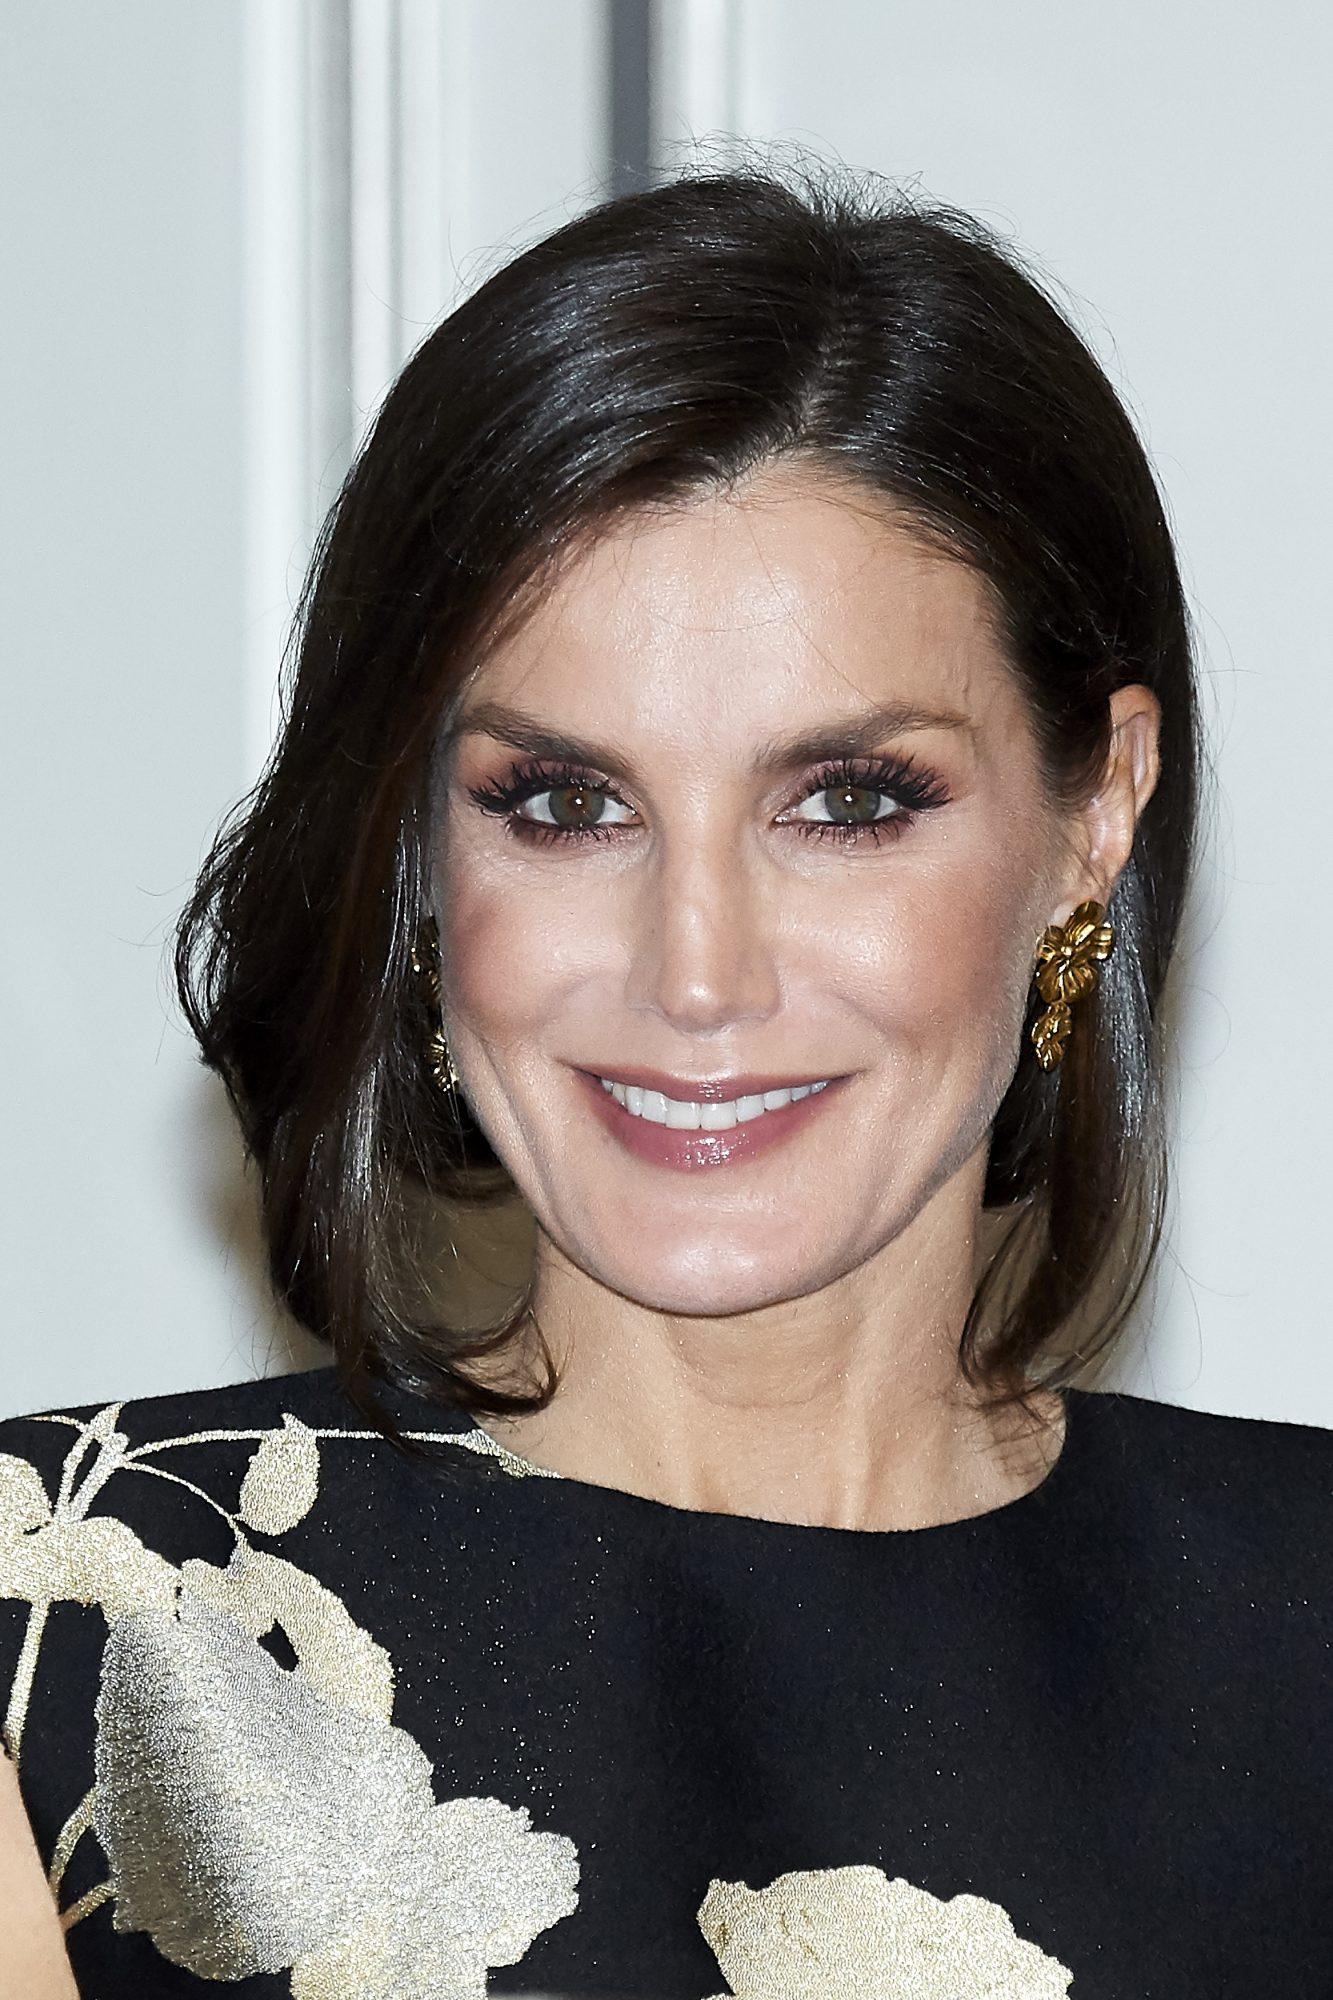 Spanish Royals Attend 'Francisco Cerecedo' Awards 2019